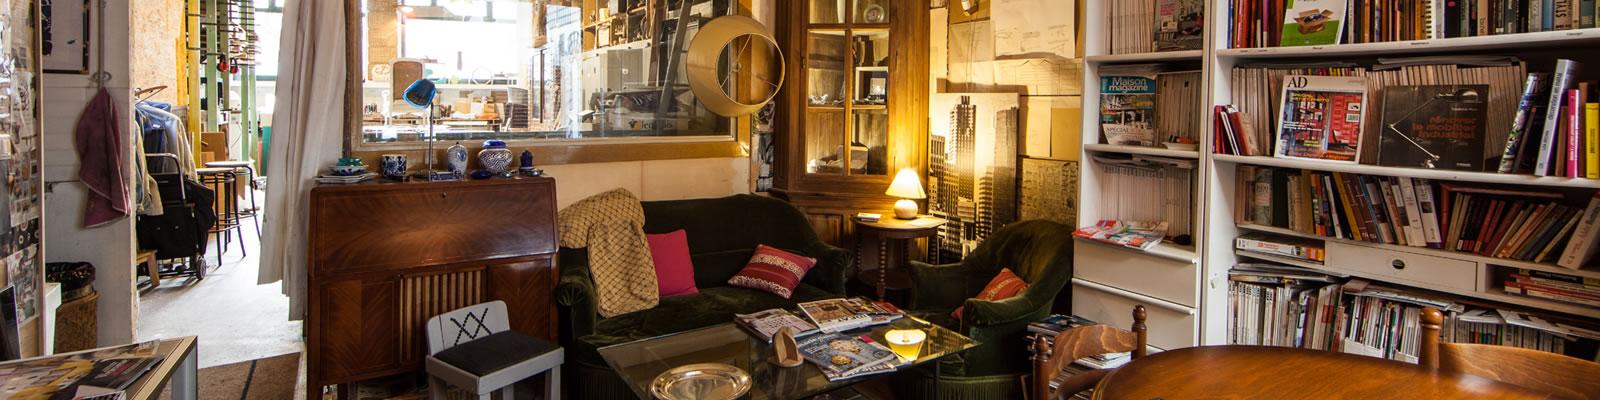 depot vente meuble paris 11. Black Bedroom Furniture Sets. Home Design Ideas